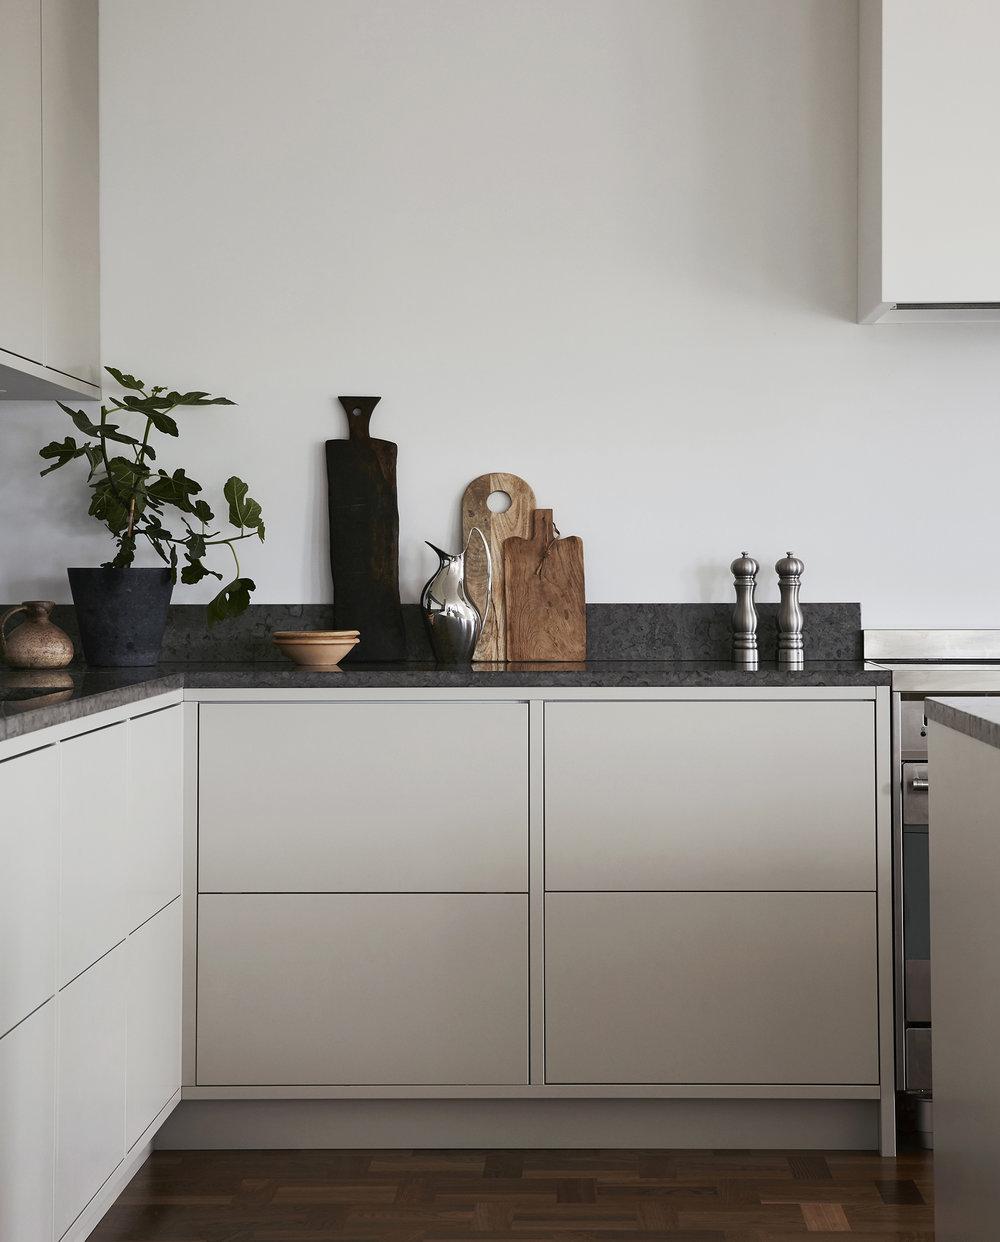 Nordiska Kök frame kitchen 2.jpg